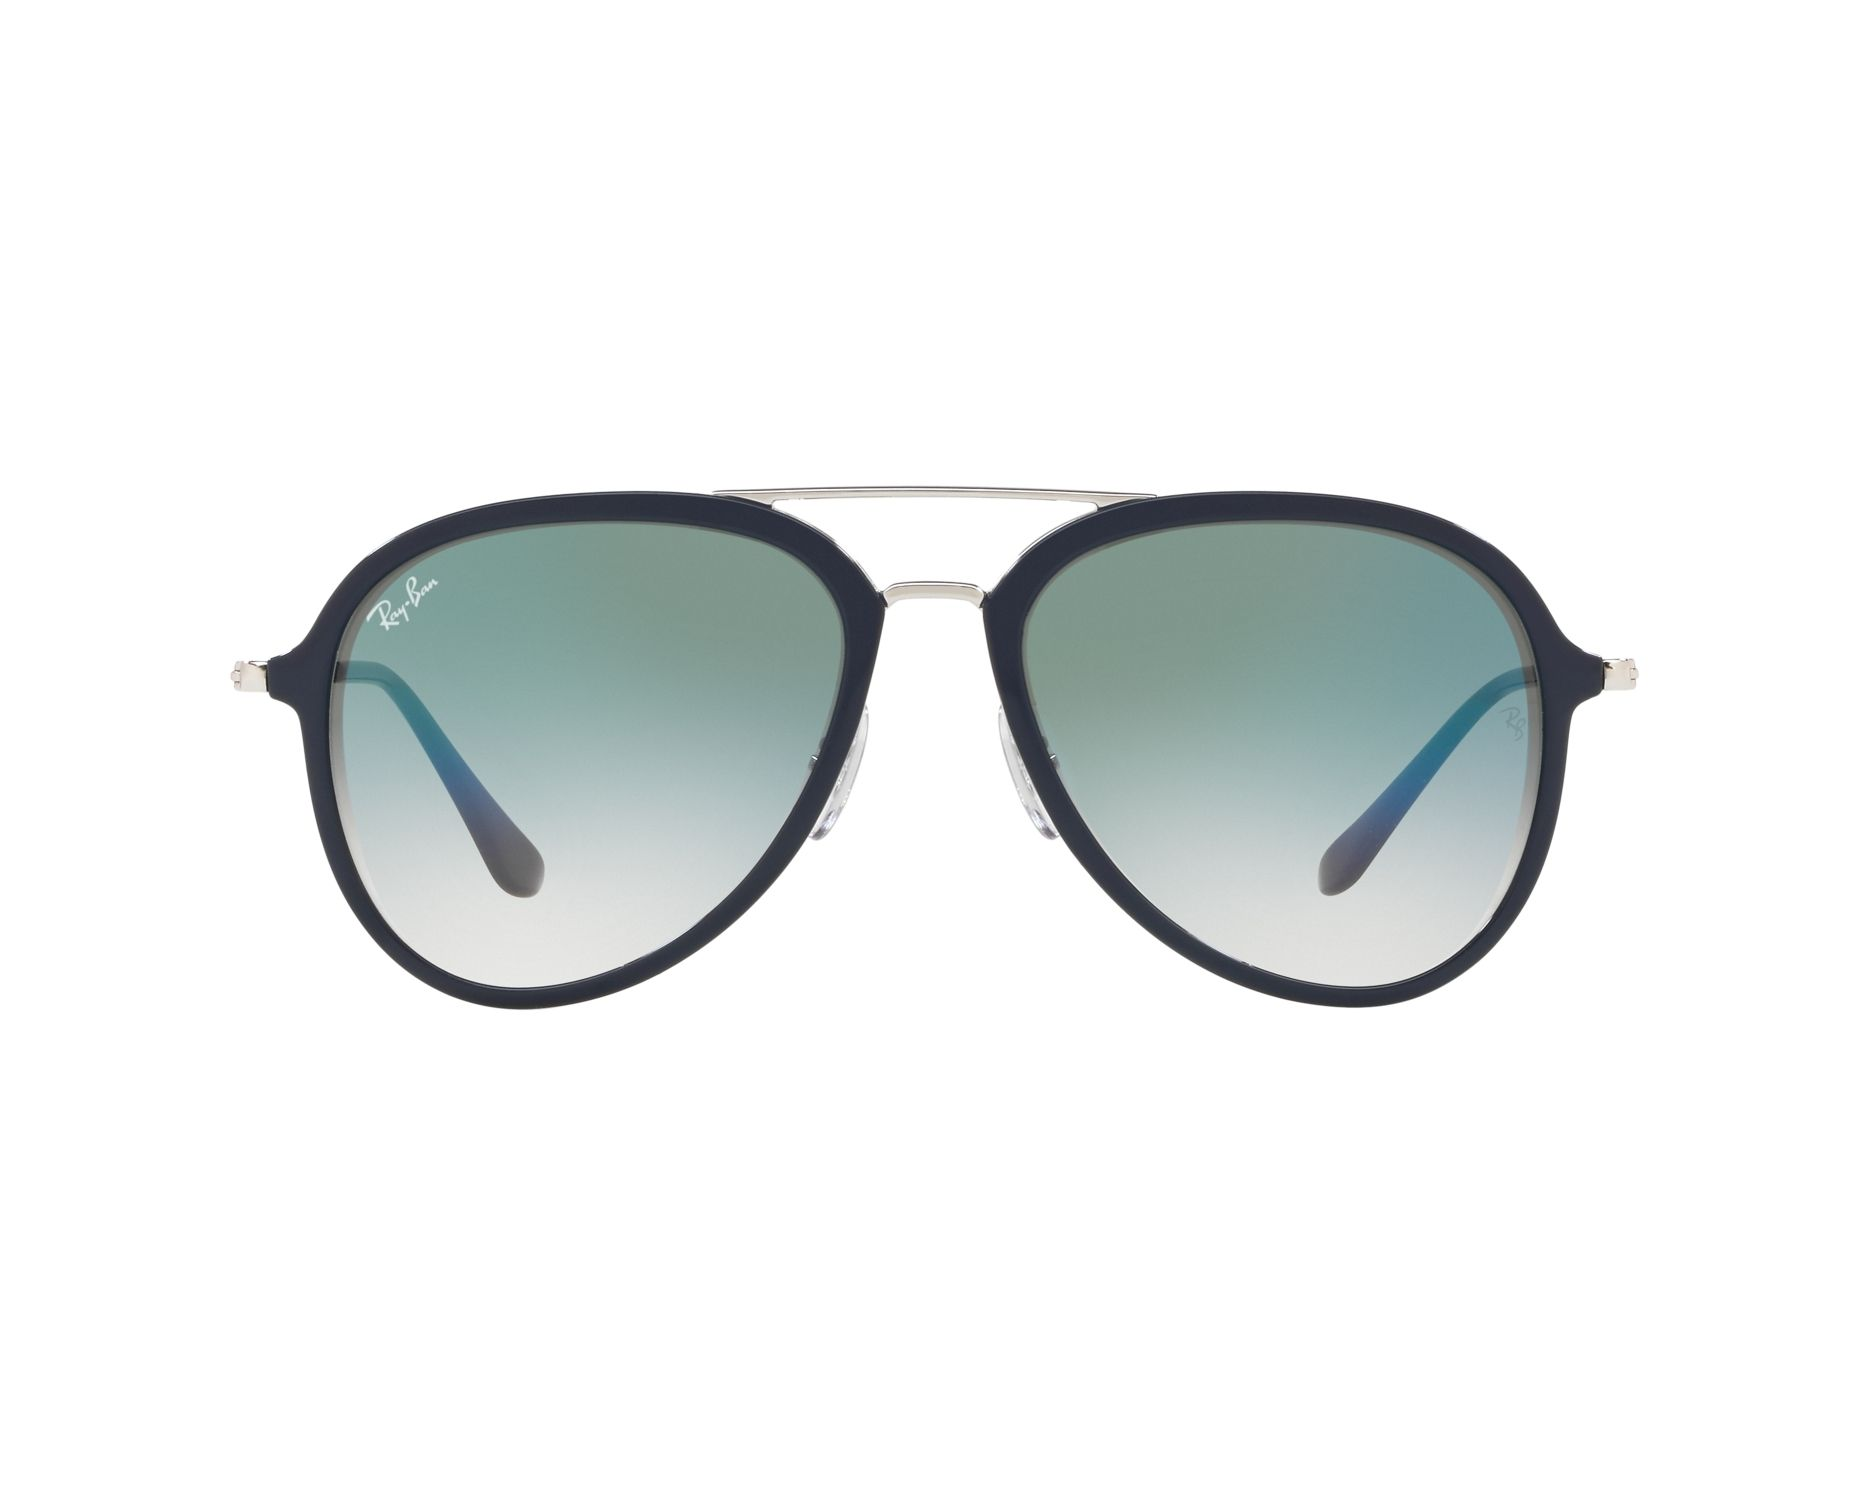 9182bc2b8a2 Sunglasses Ray-Ban RB-4298 63343A 57-17 Blue Silver 360 degree view